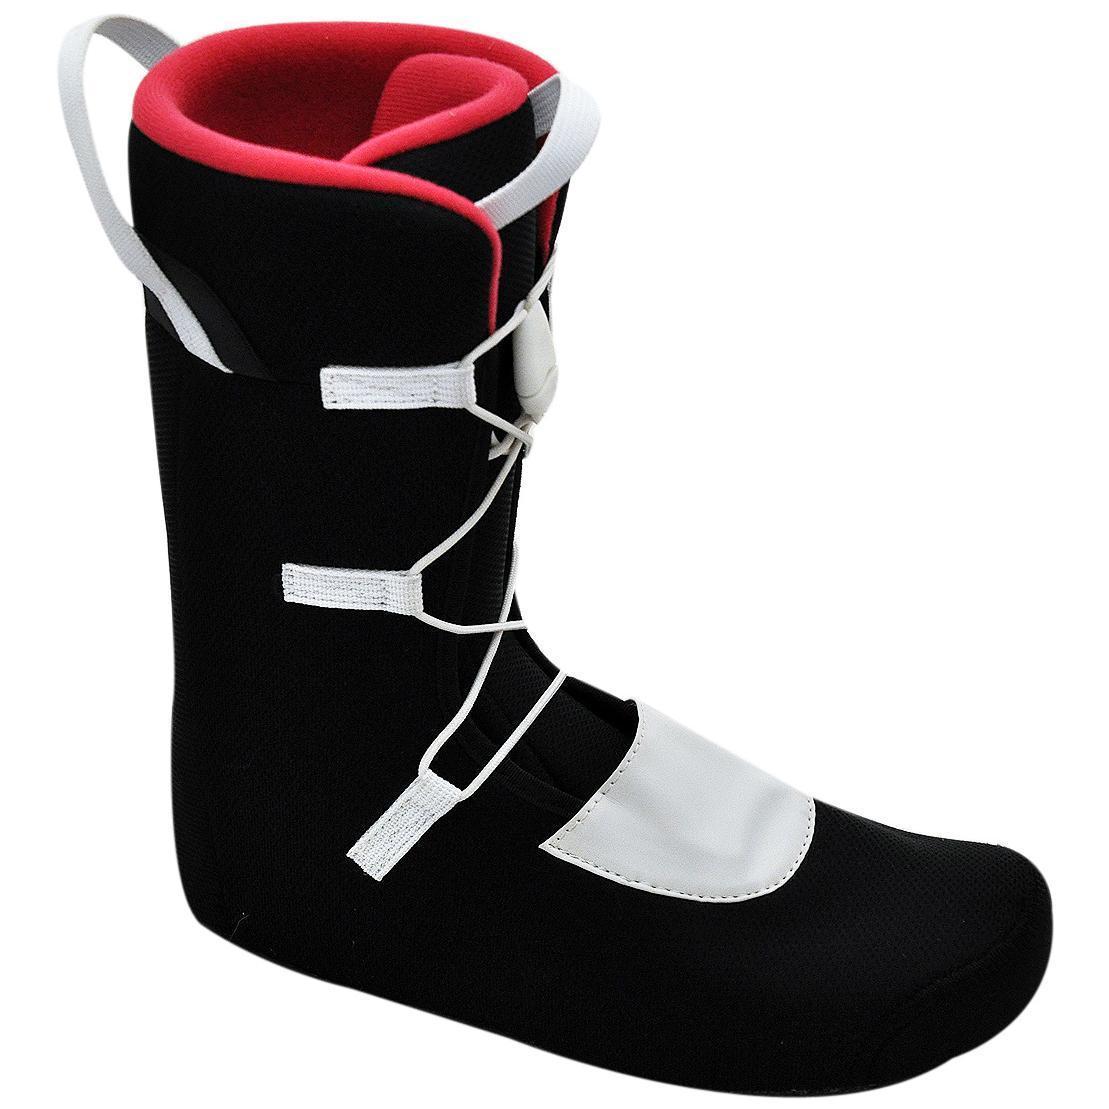 9cd00e1137b3 Ботинки для сноуборда BF snowboards 2018-19 ATTITUDE - купить ...